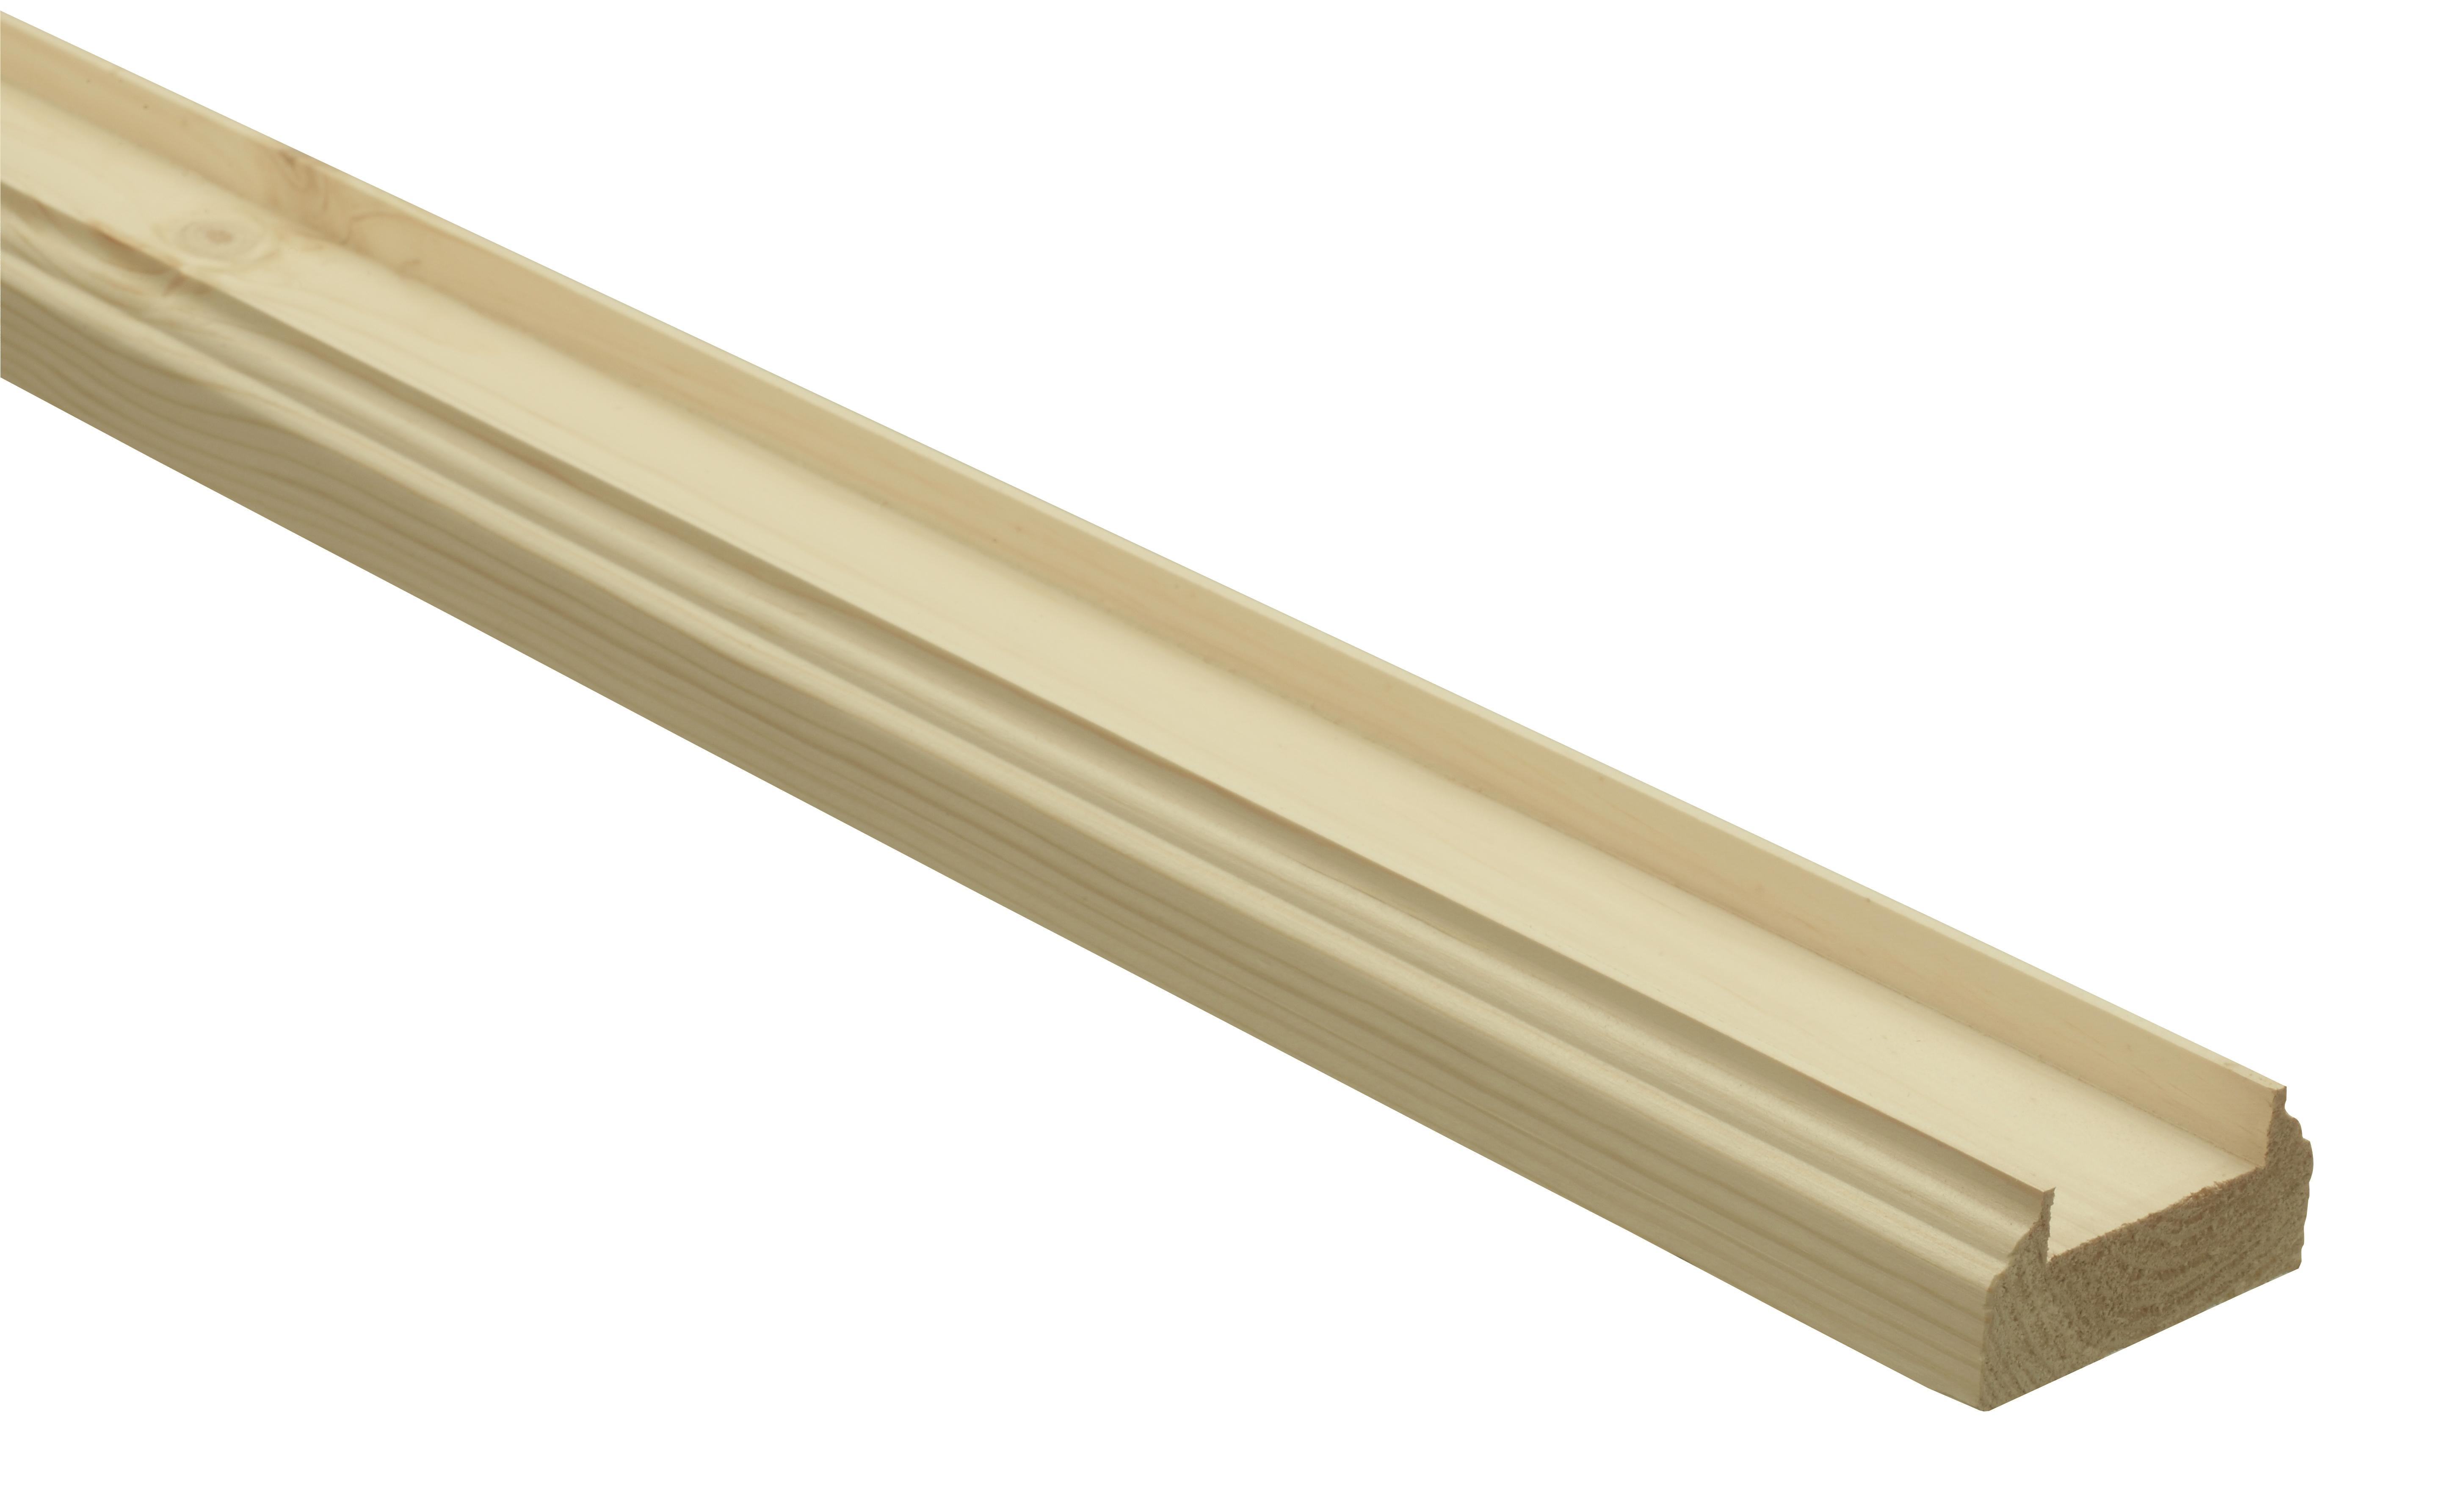 1 Pine Baserail Prof 4200 32